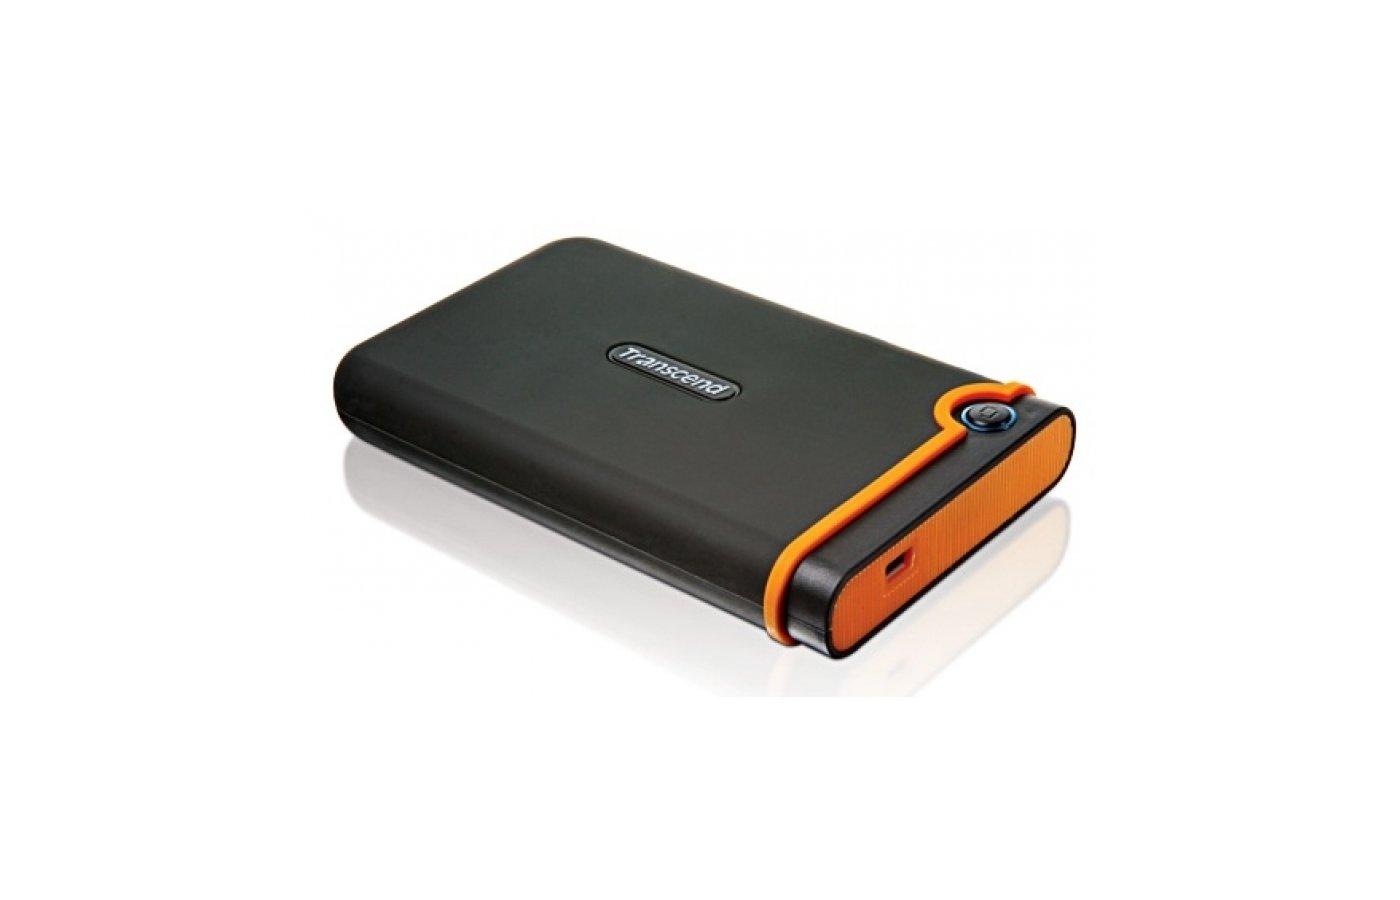 "Внешний жесткий диск Transcend, 1TB StoreJet Mobile 2.5"", USB2.0 (TS1TSJ25M2)"